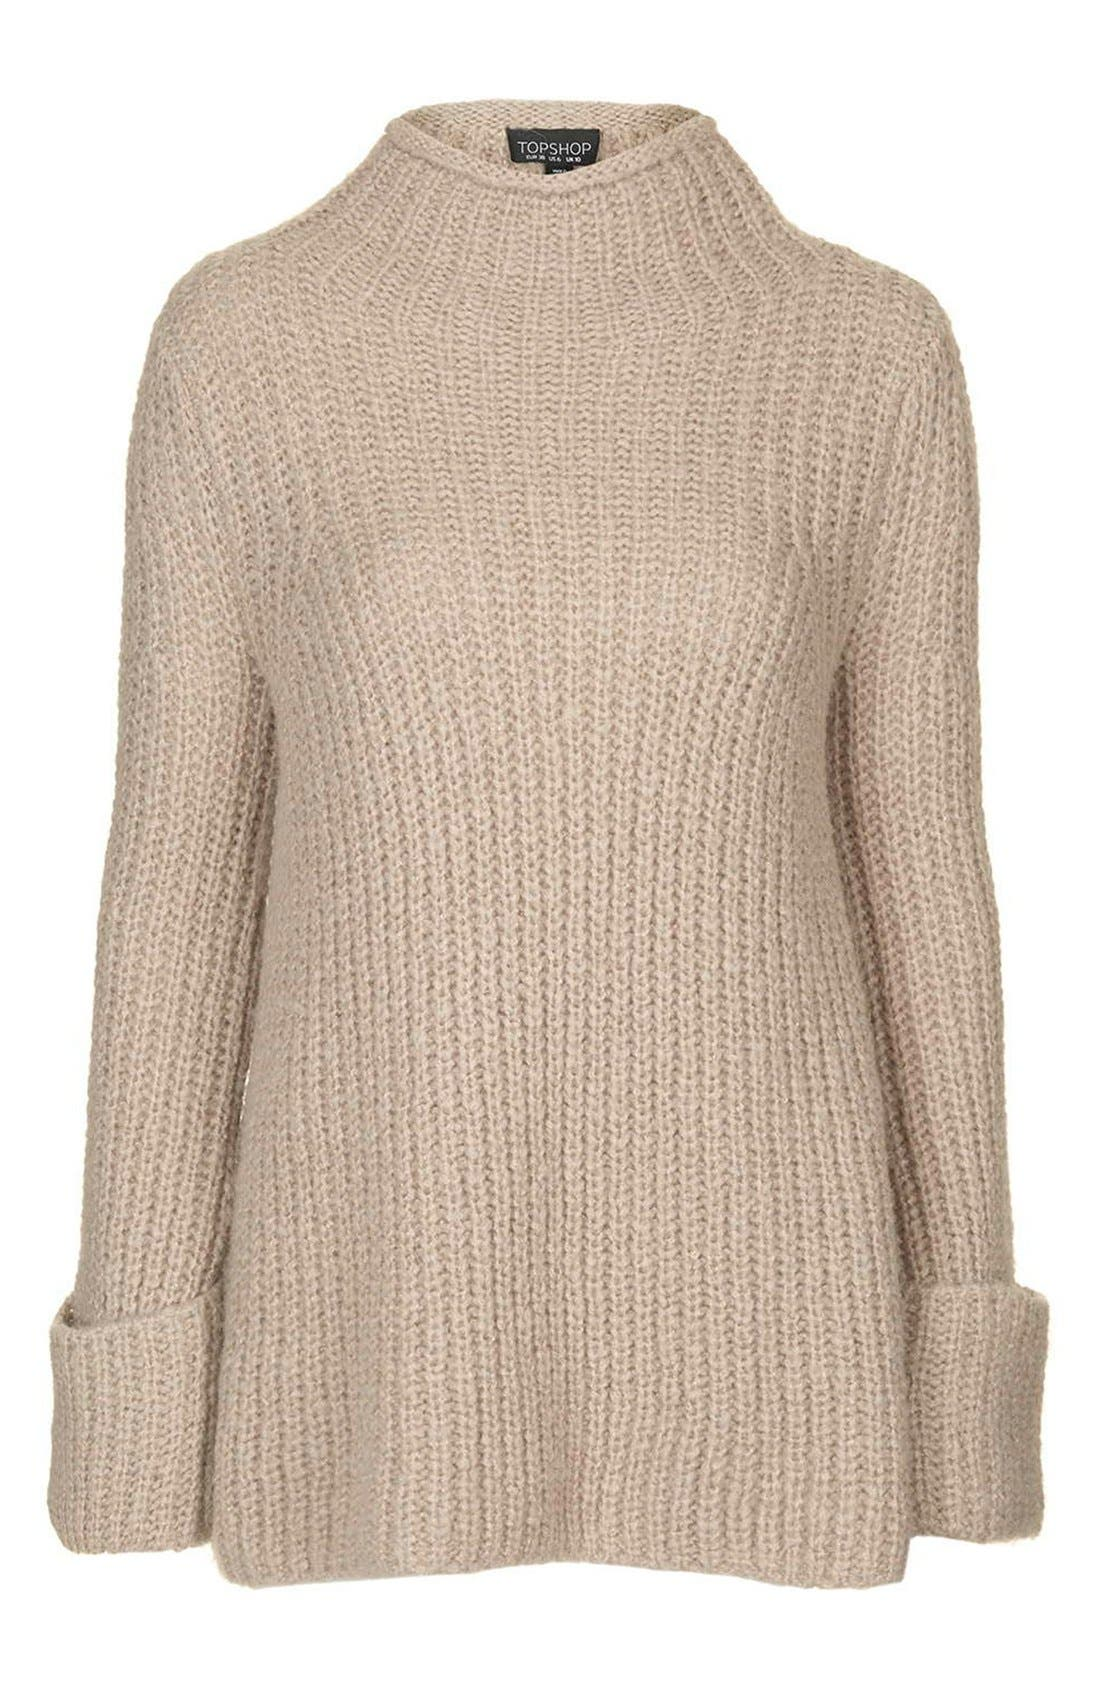 Alternate Image 4  - Topshop 'Jumbo' Funnel Neck Sweater